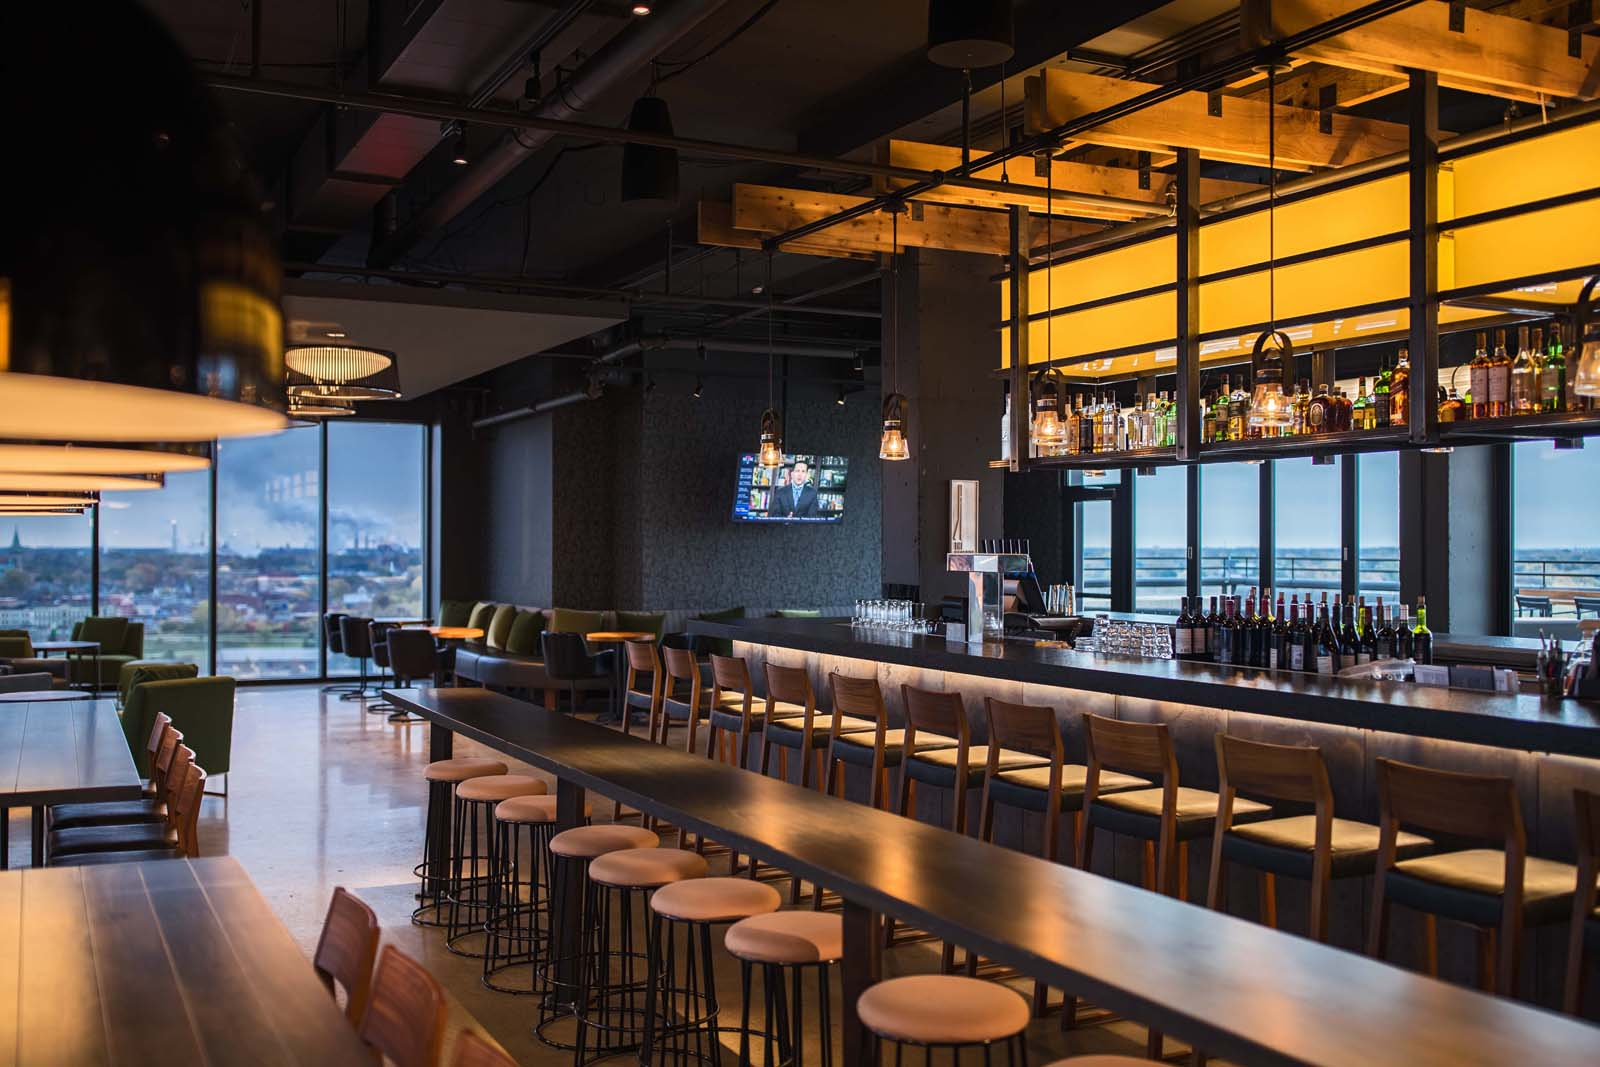 Rooftop Bar Experience In Toledo Ohio